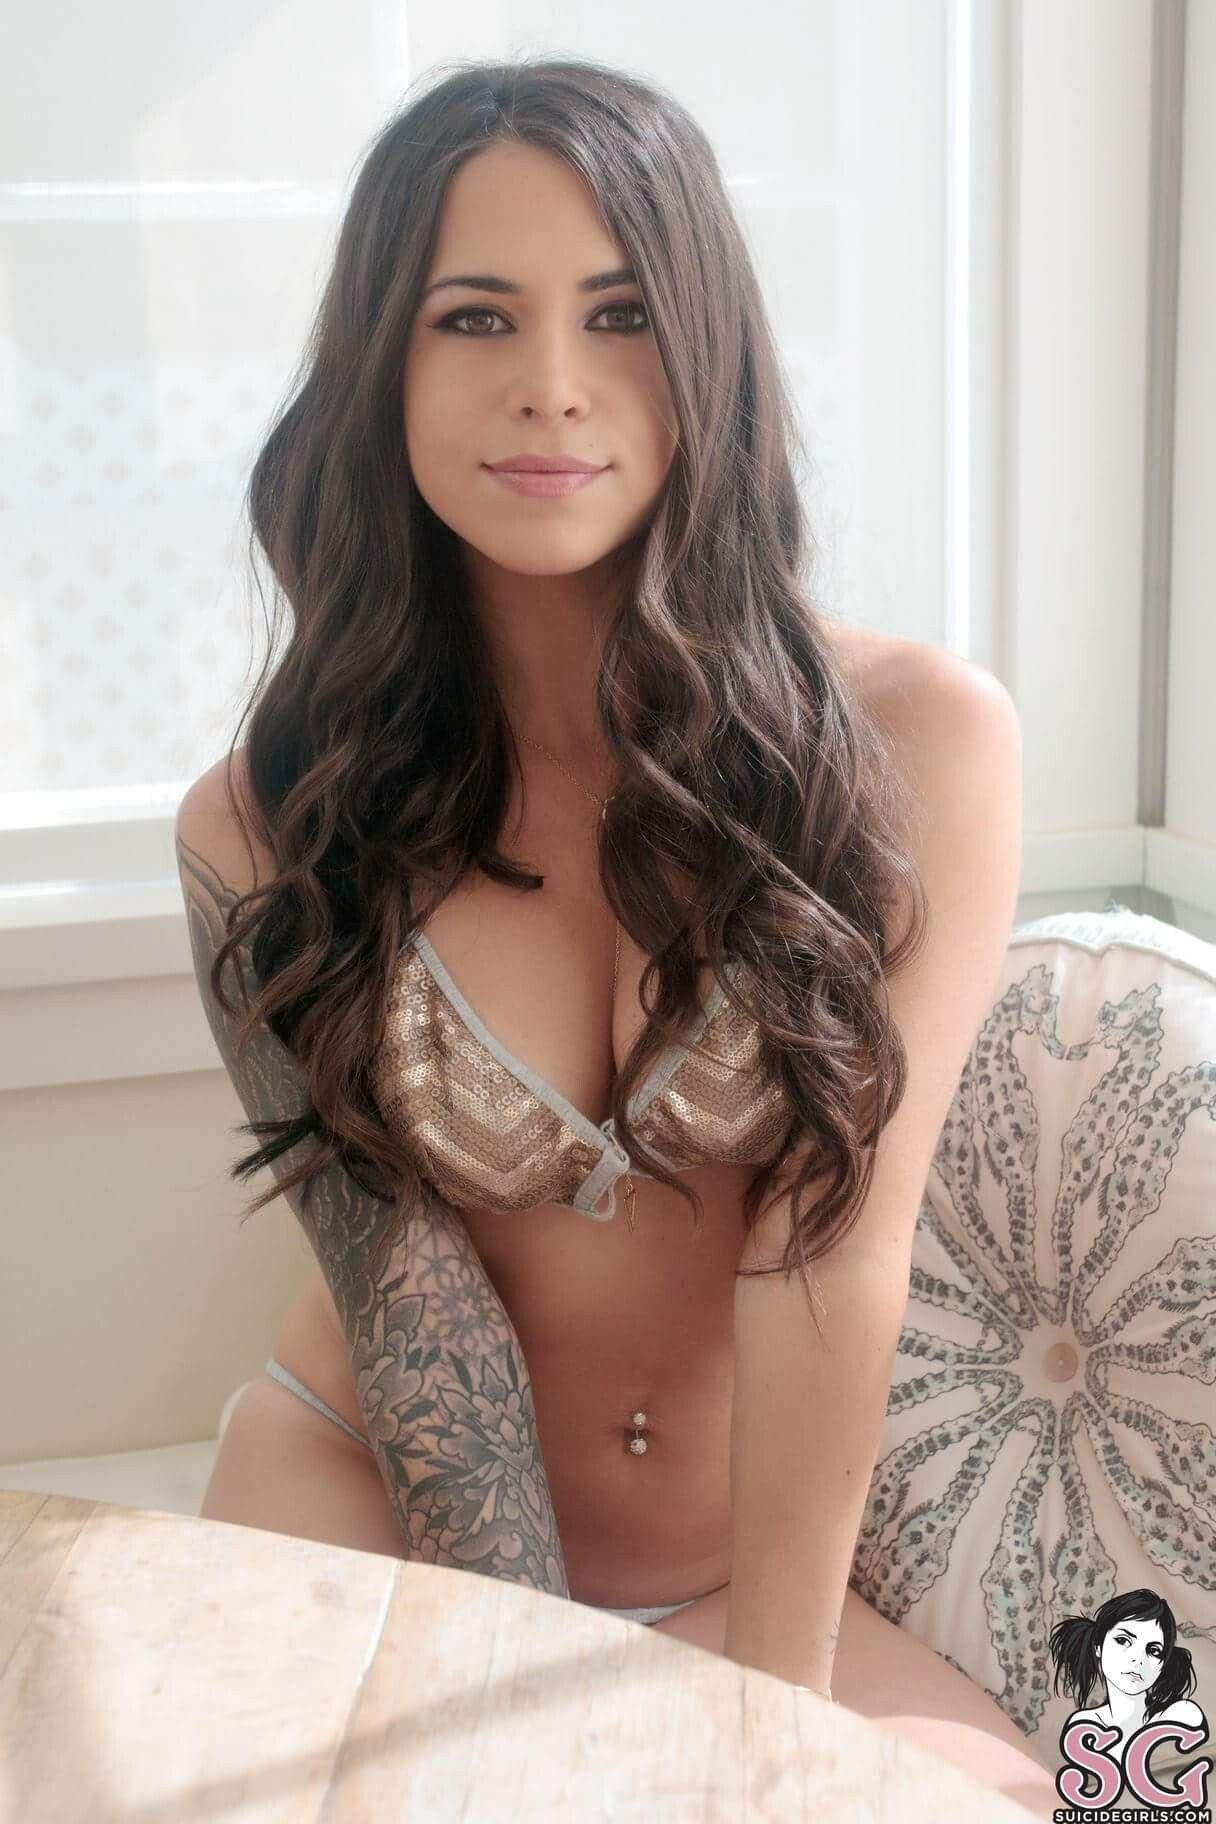 Hot Suttin nude photos 2019